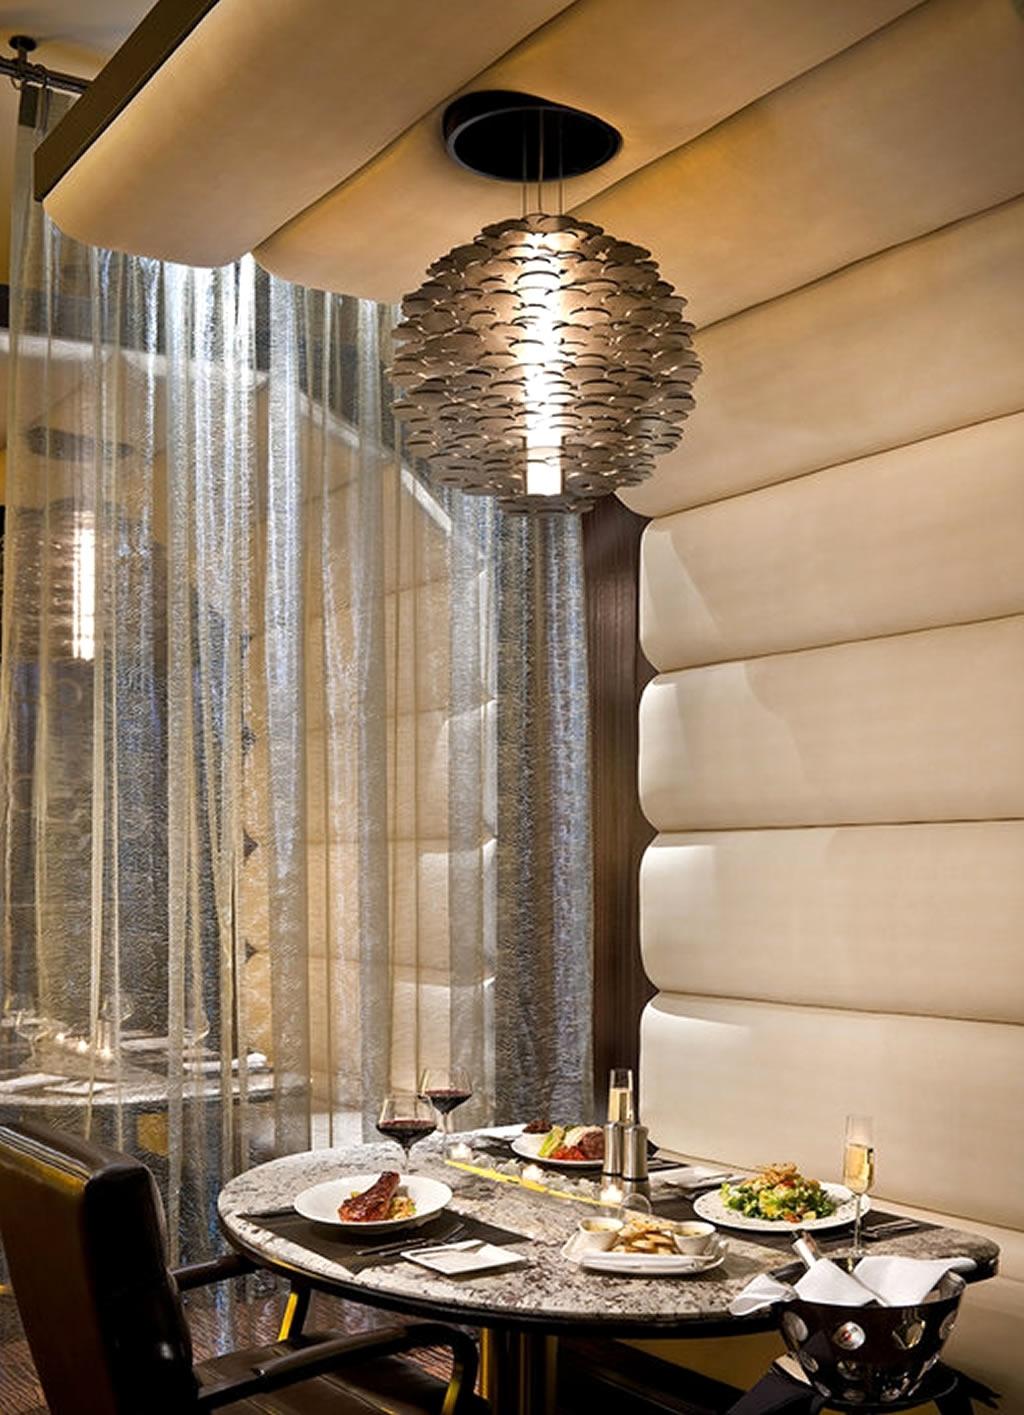 Newest Restaurant Chandelier Within Restaurant Chandelier Lighting Design Of Atlantis Steakhouse, Reno (View 5 of 20)